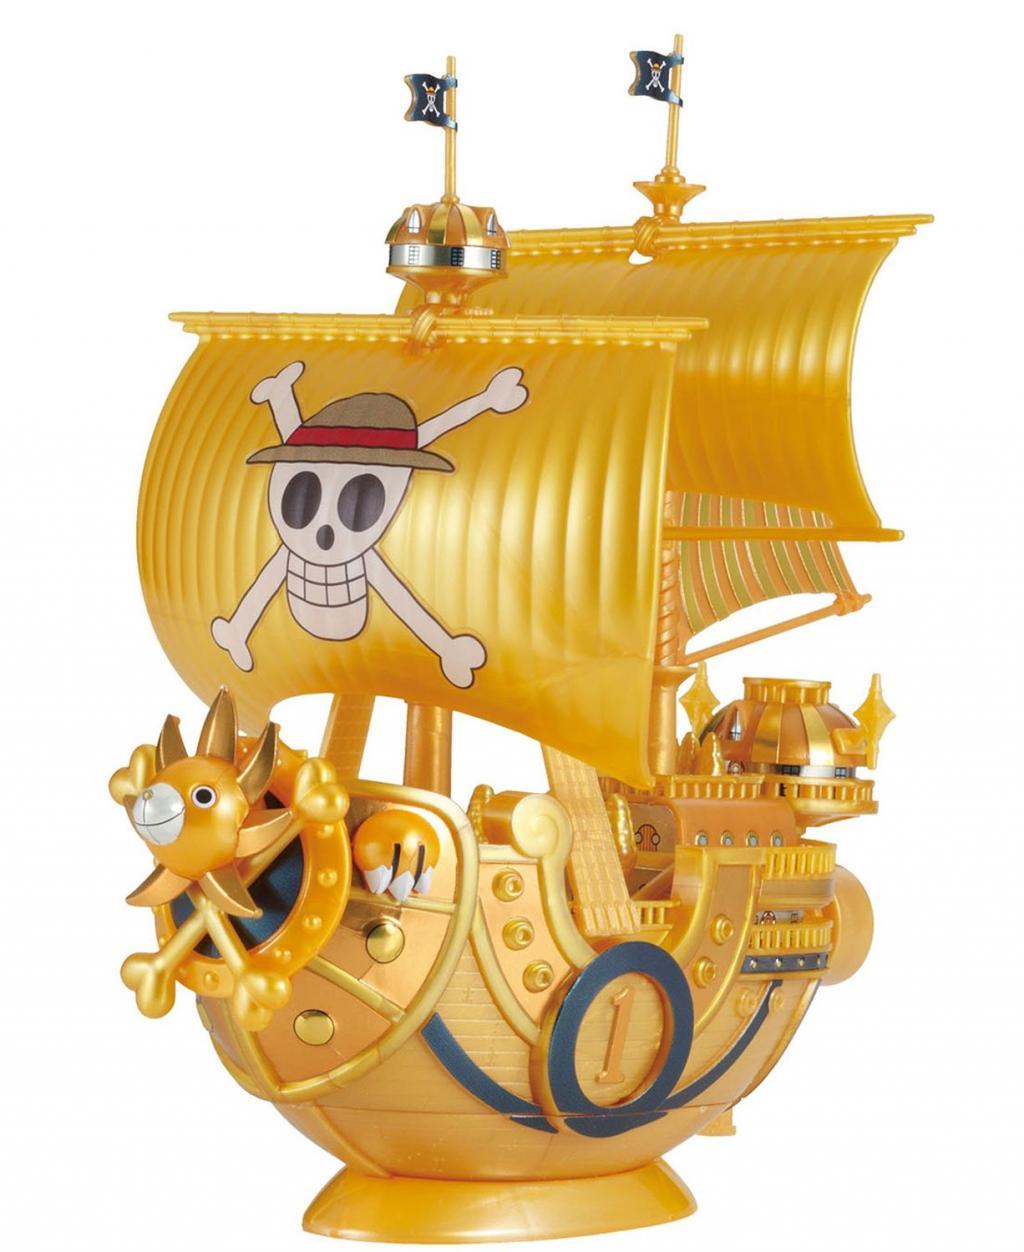 ONE PIECE - Model Kit - Ship - Thousand Sunny Gold - 15 CM